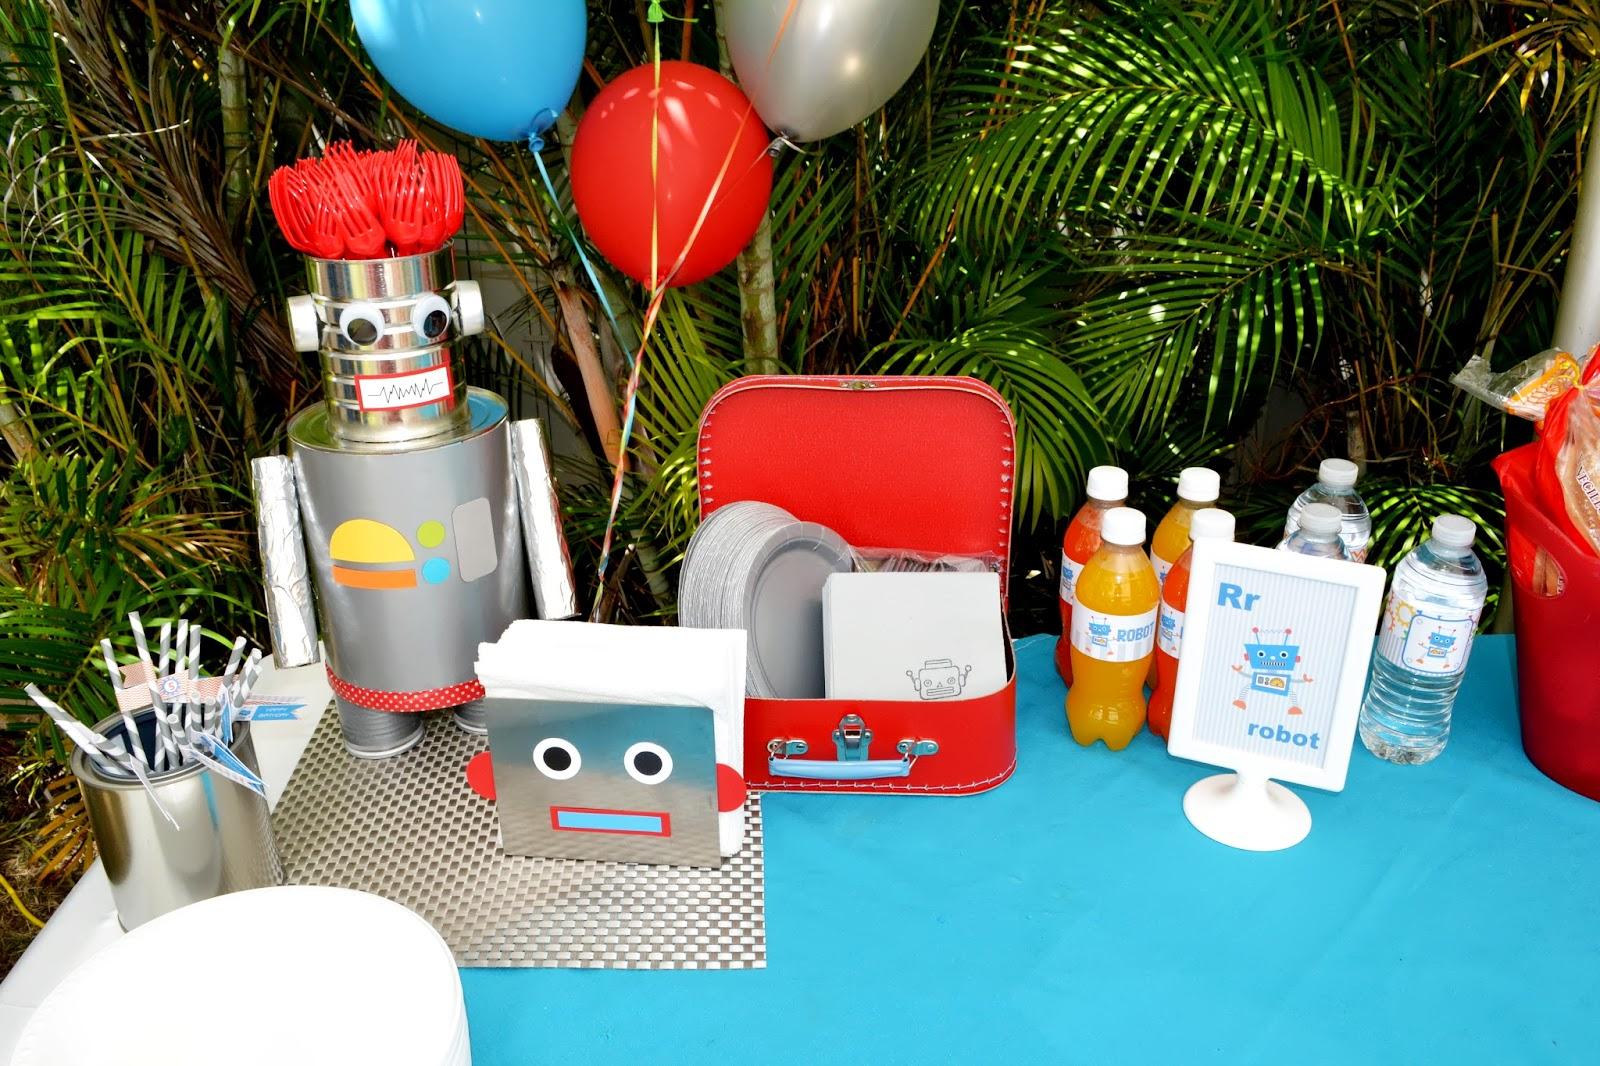 Birthday Birthday Party Ideas: Partylicious Events PR: Birthdays: {Robot Party}